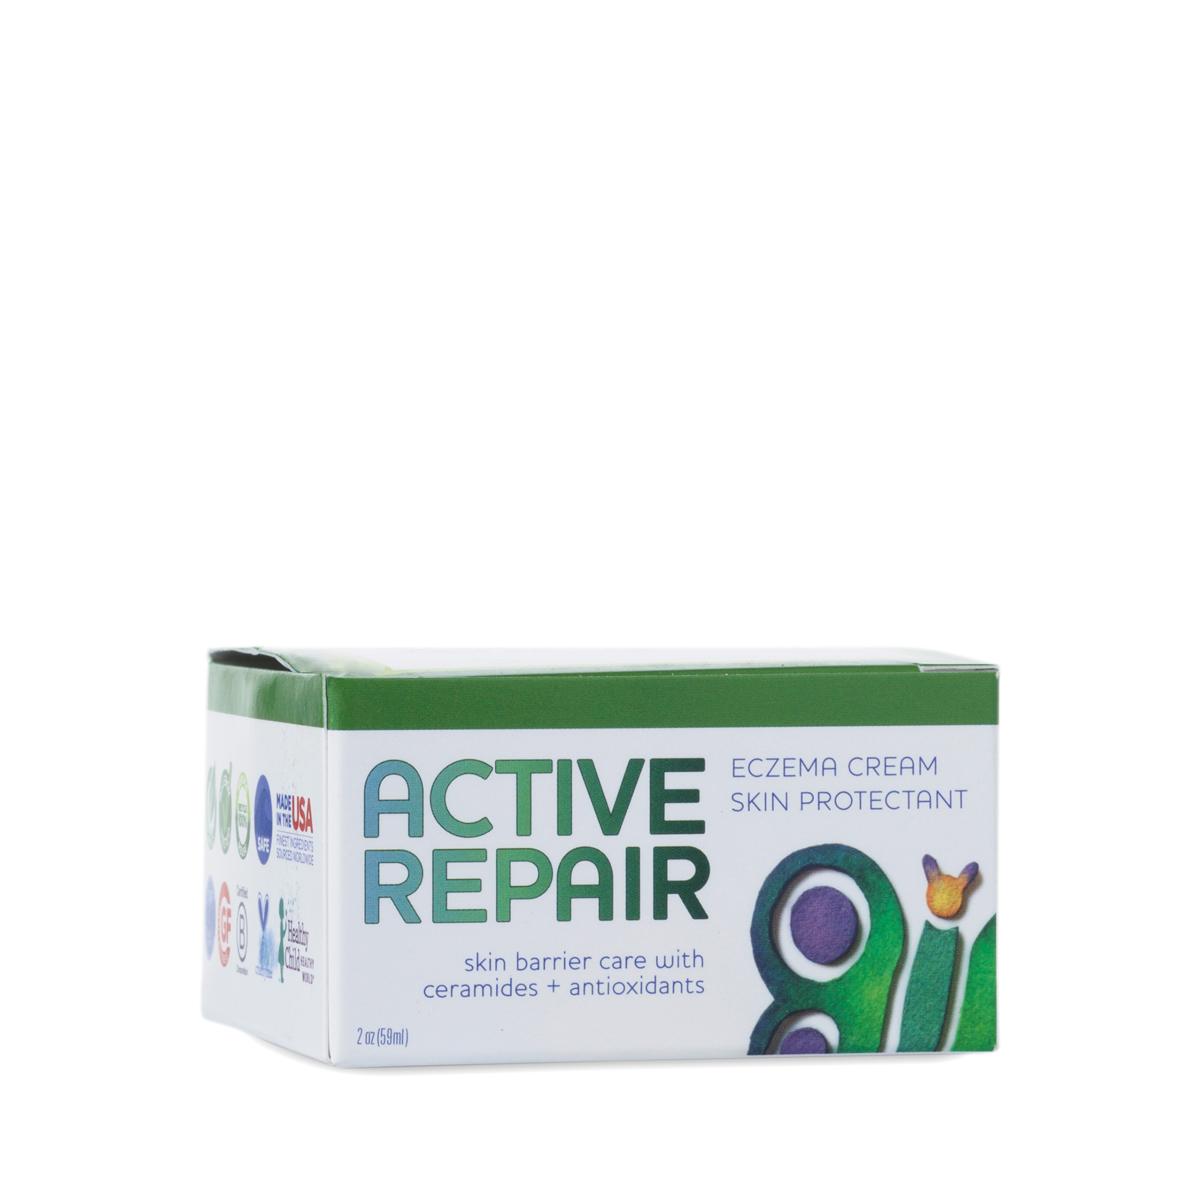 Epicencial Active Repair Eczema Cream